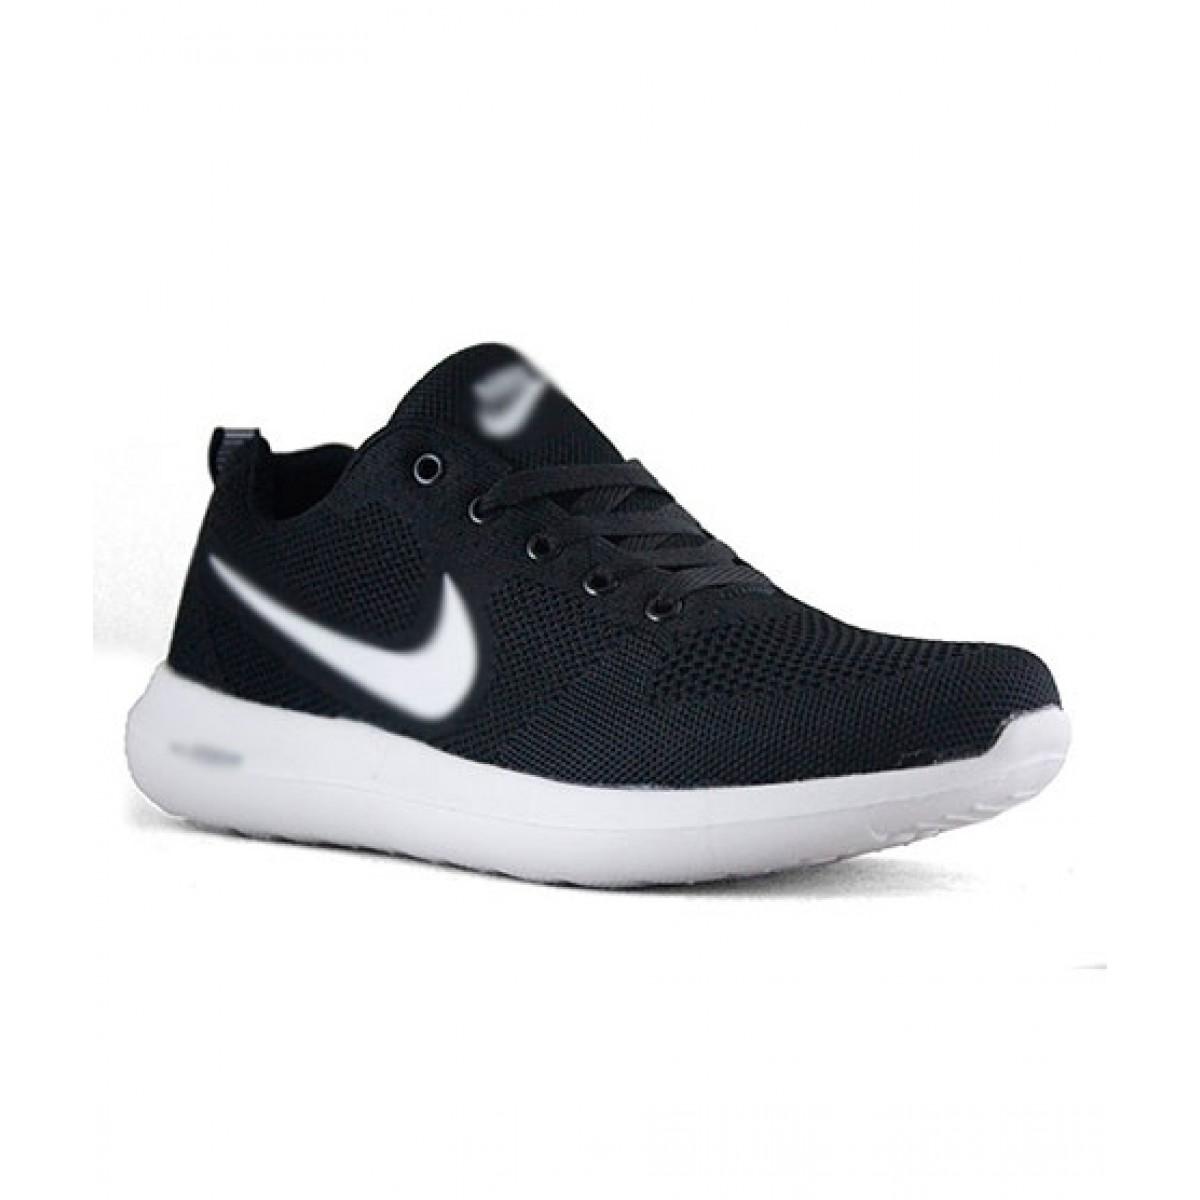 The Smart Shop Casual Sneaker For Men (0855)